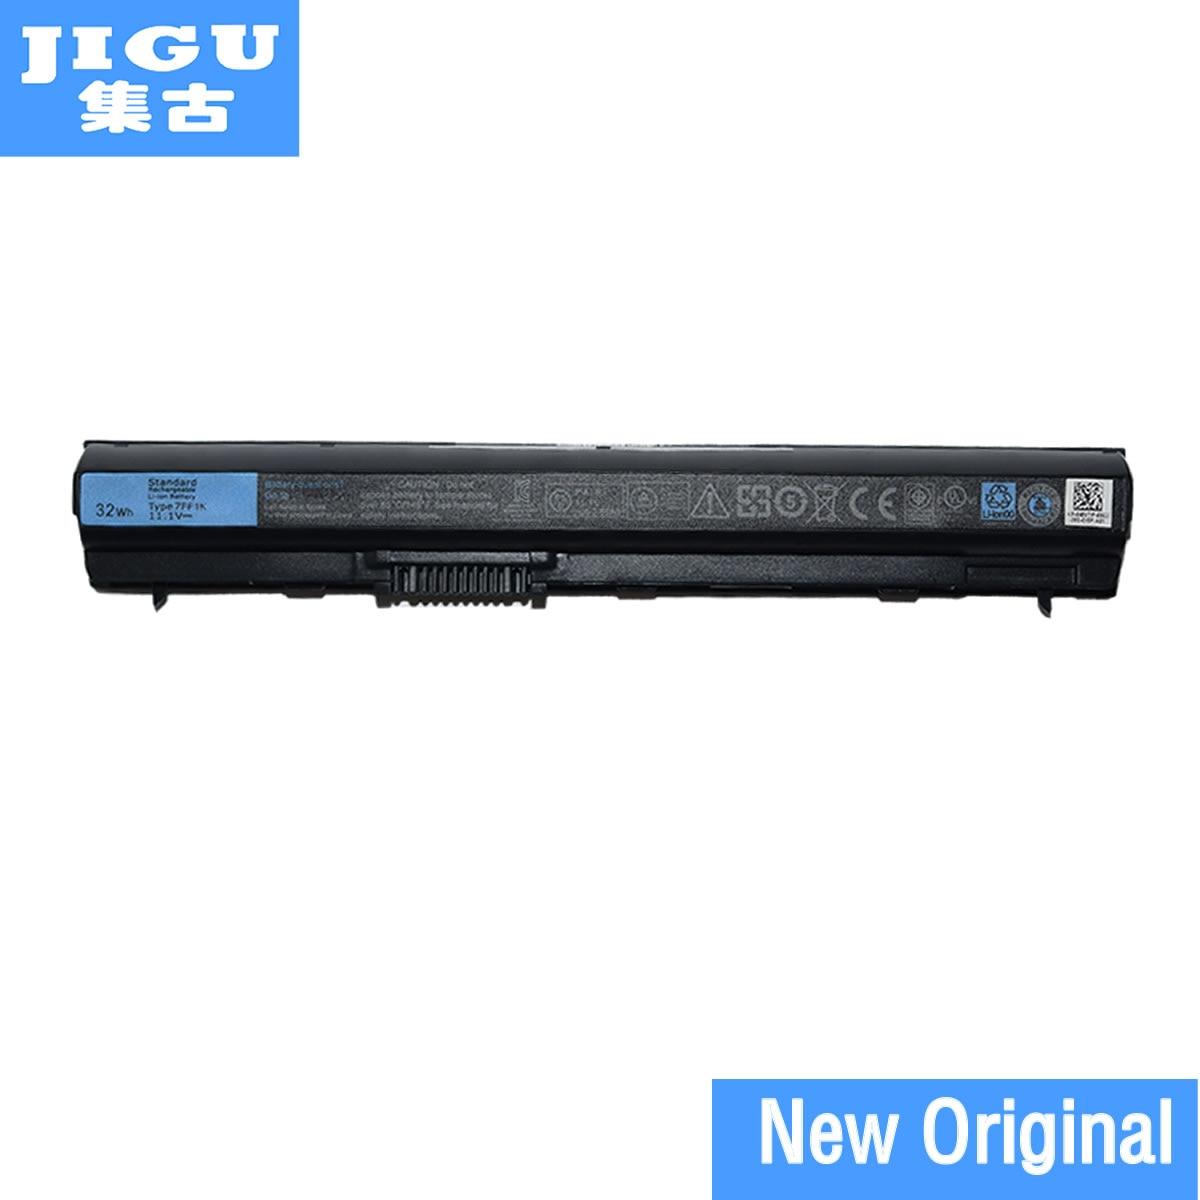 JIGU Original Laptop Battery For Dell For Latitude E6120 E6220 E6230 E6320 E6330 E6320 E6430s 09K6P 0F7W7V 11HYV 3W2YX 5X317